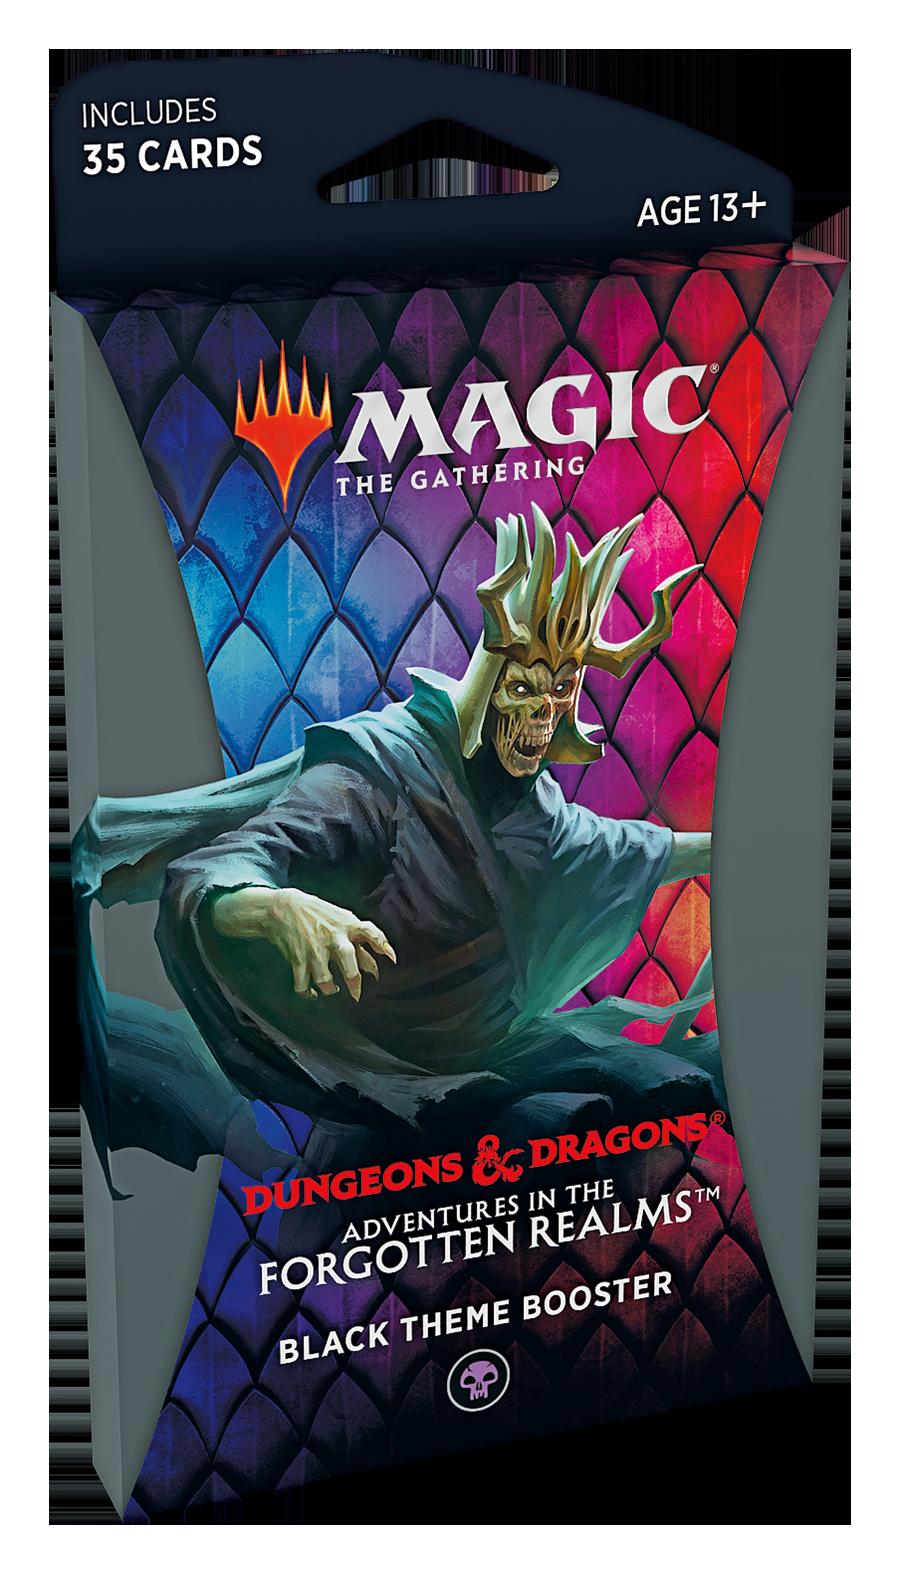 MTG Forgotten Realms Theme Booster